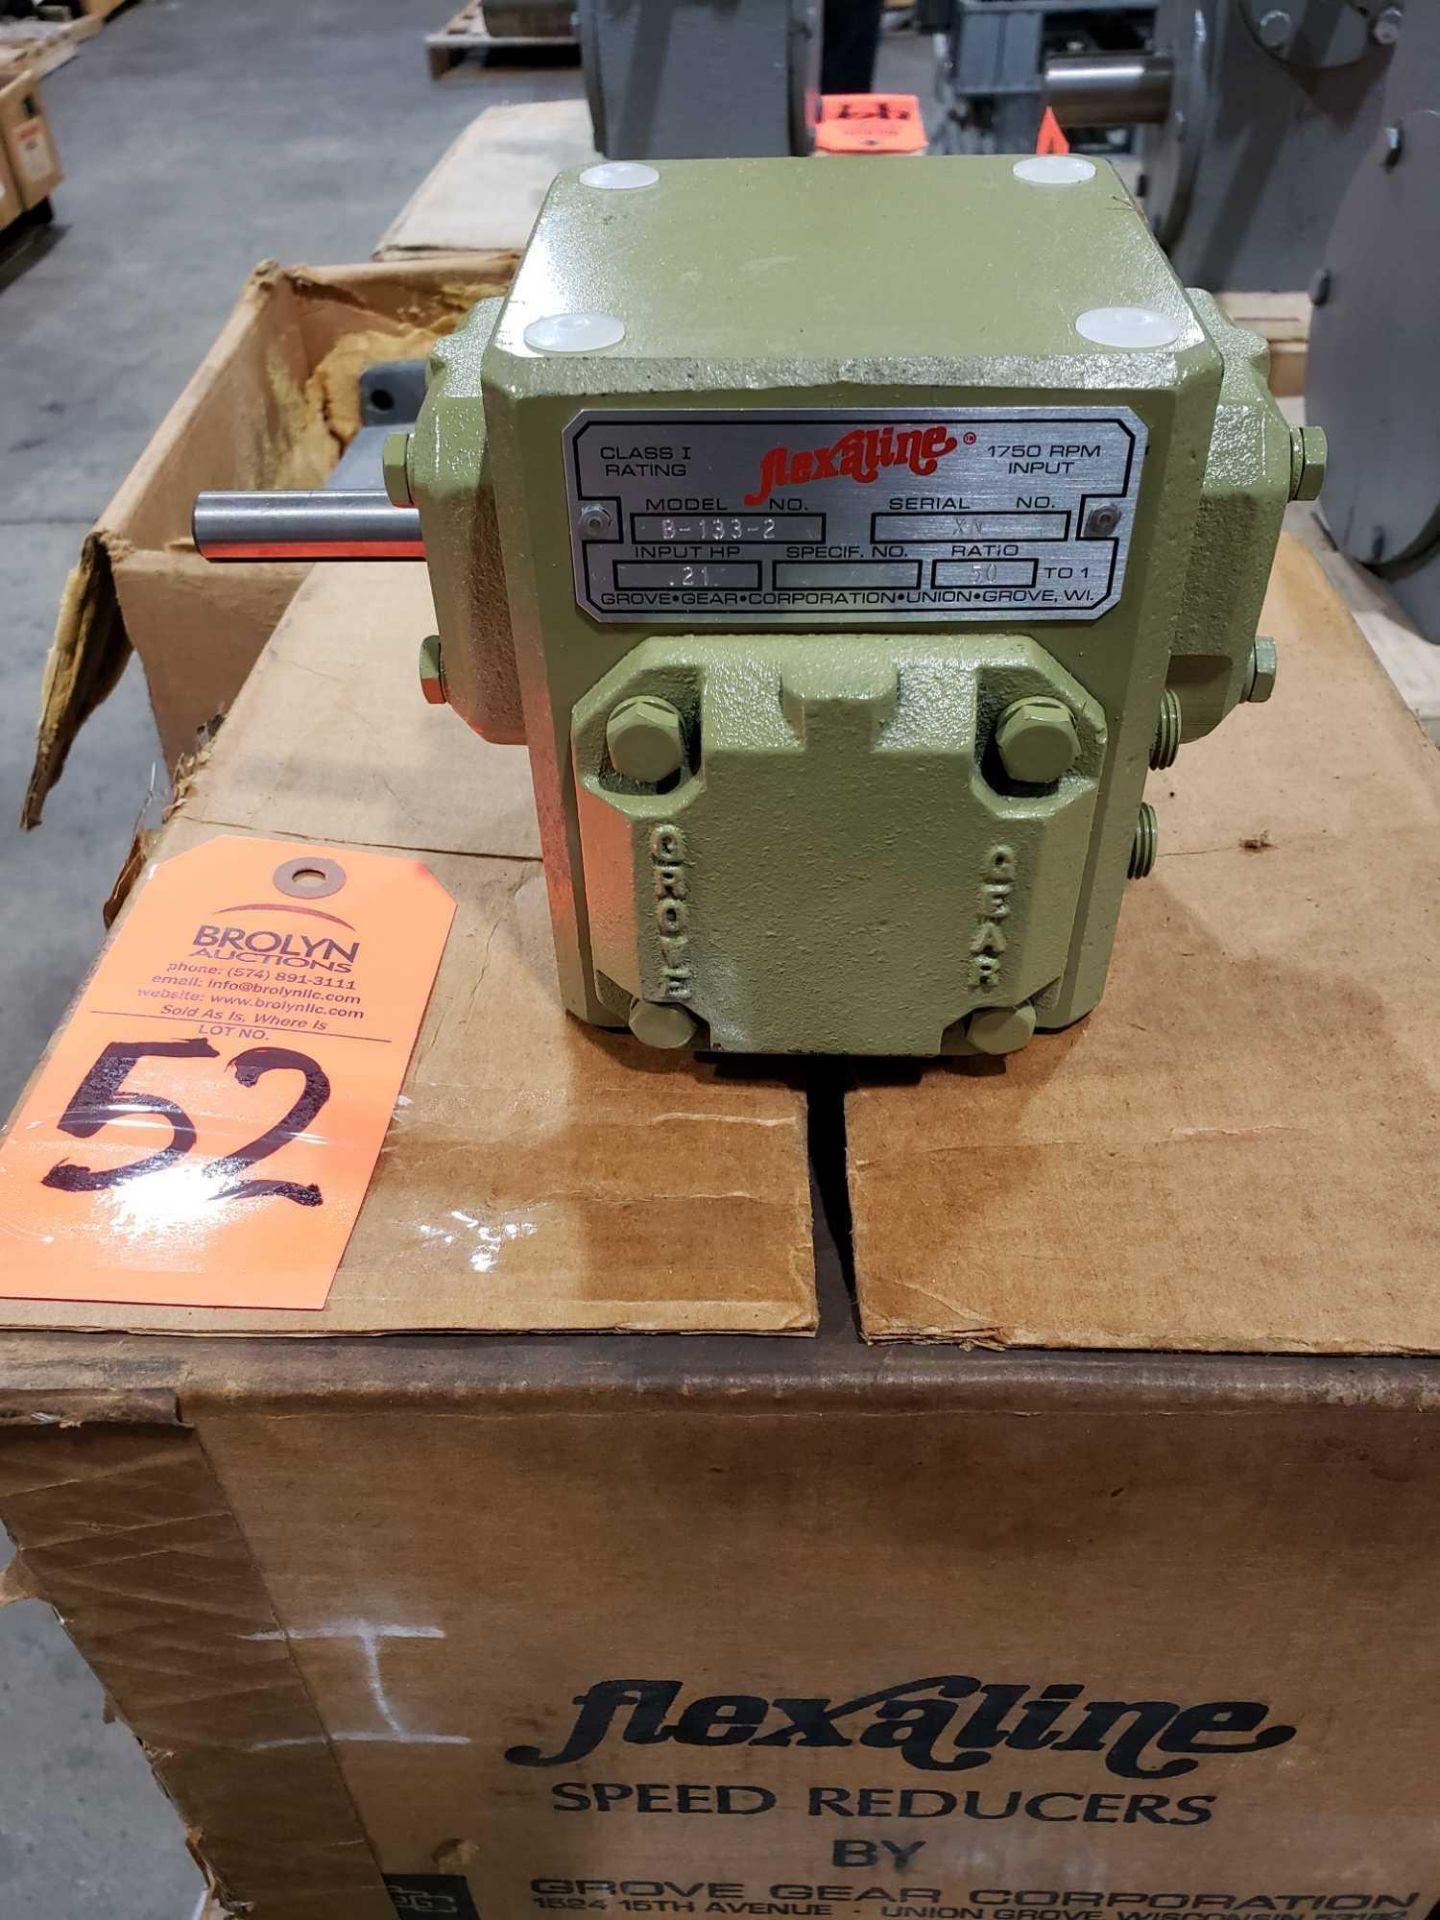 Lot 52 - Grove Gear Flexaline model B-133-2 gear box, ratio 50:1. New in box.